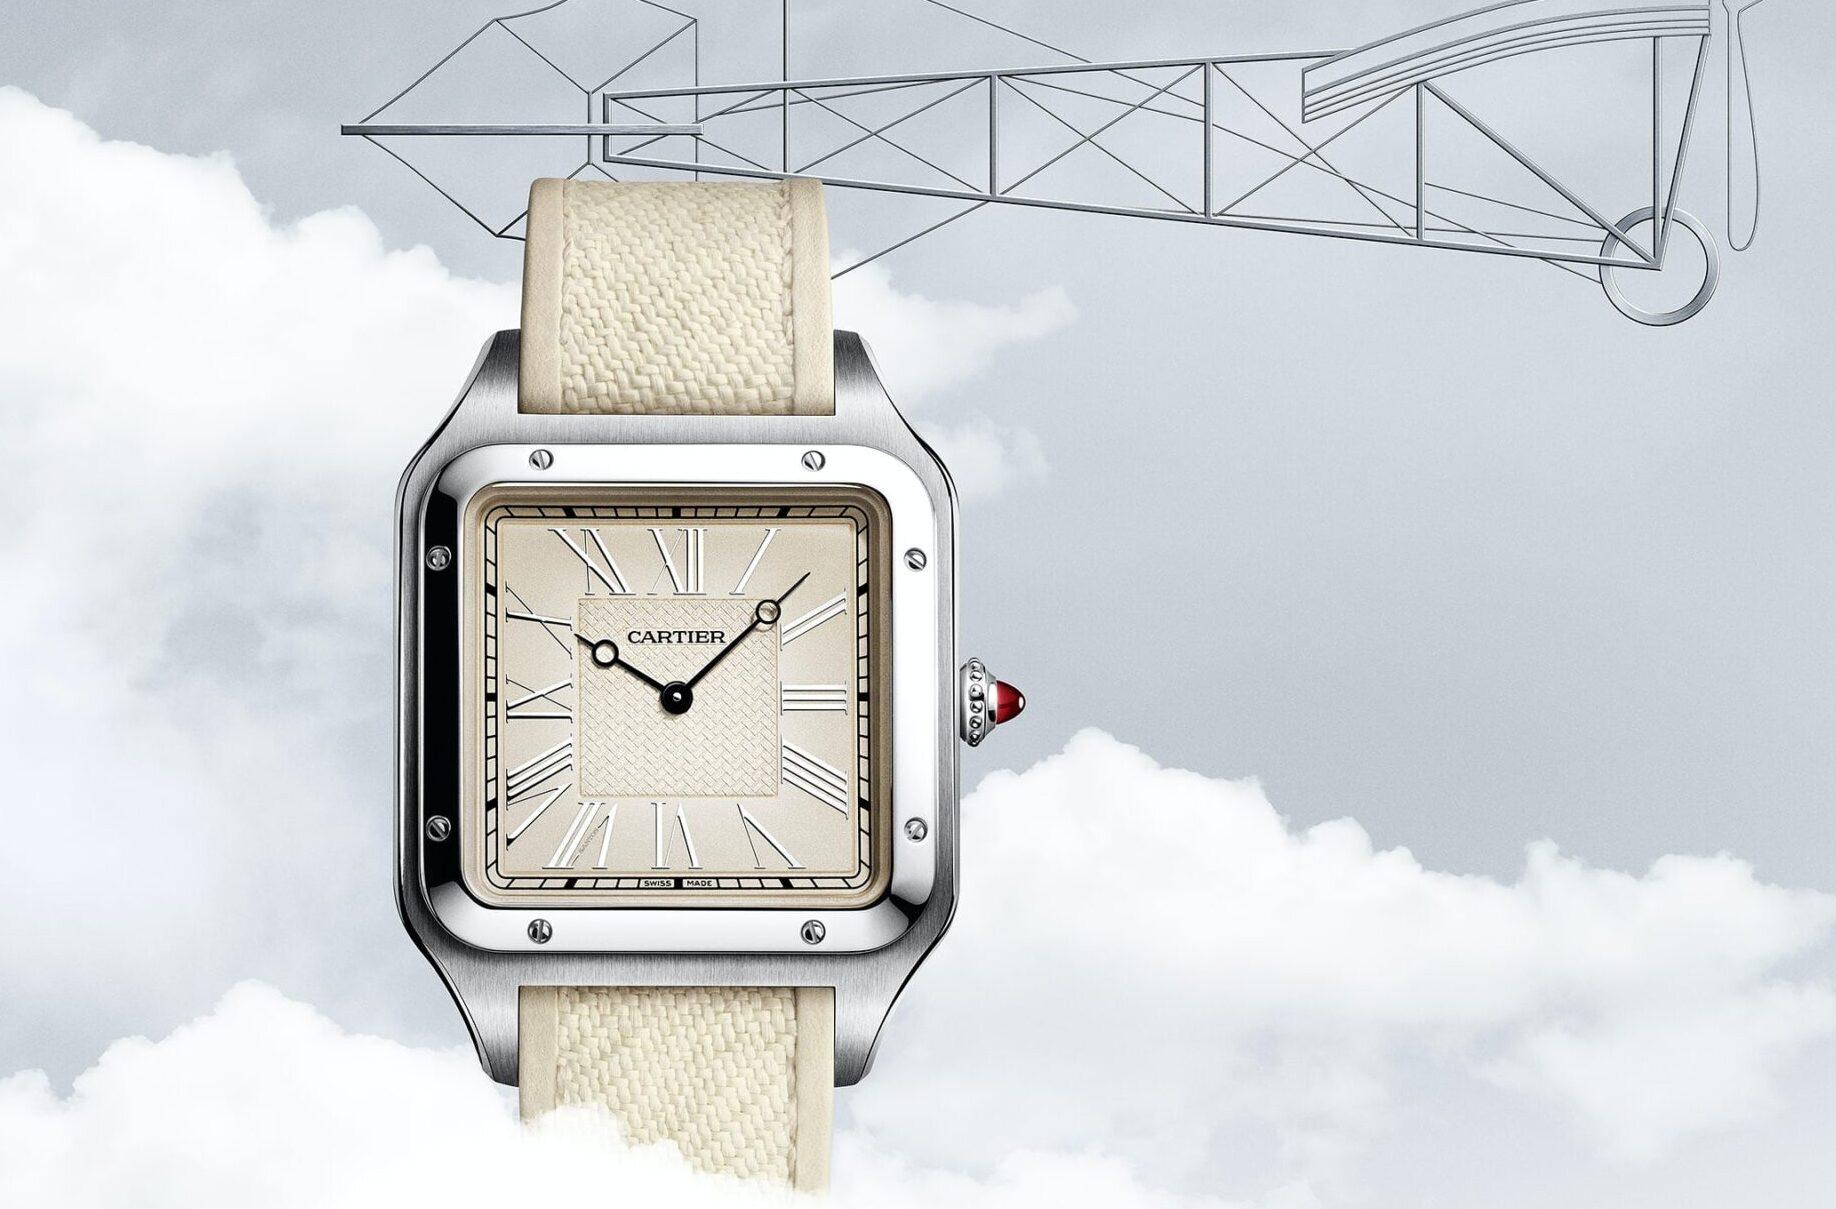 Cartier Santos-Dumont La Demoiselle Limited Edition Watches and Wonders-